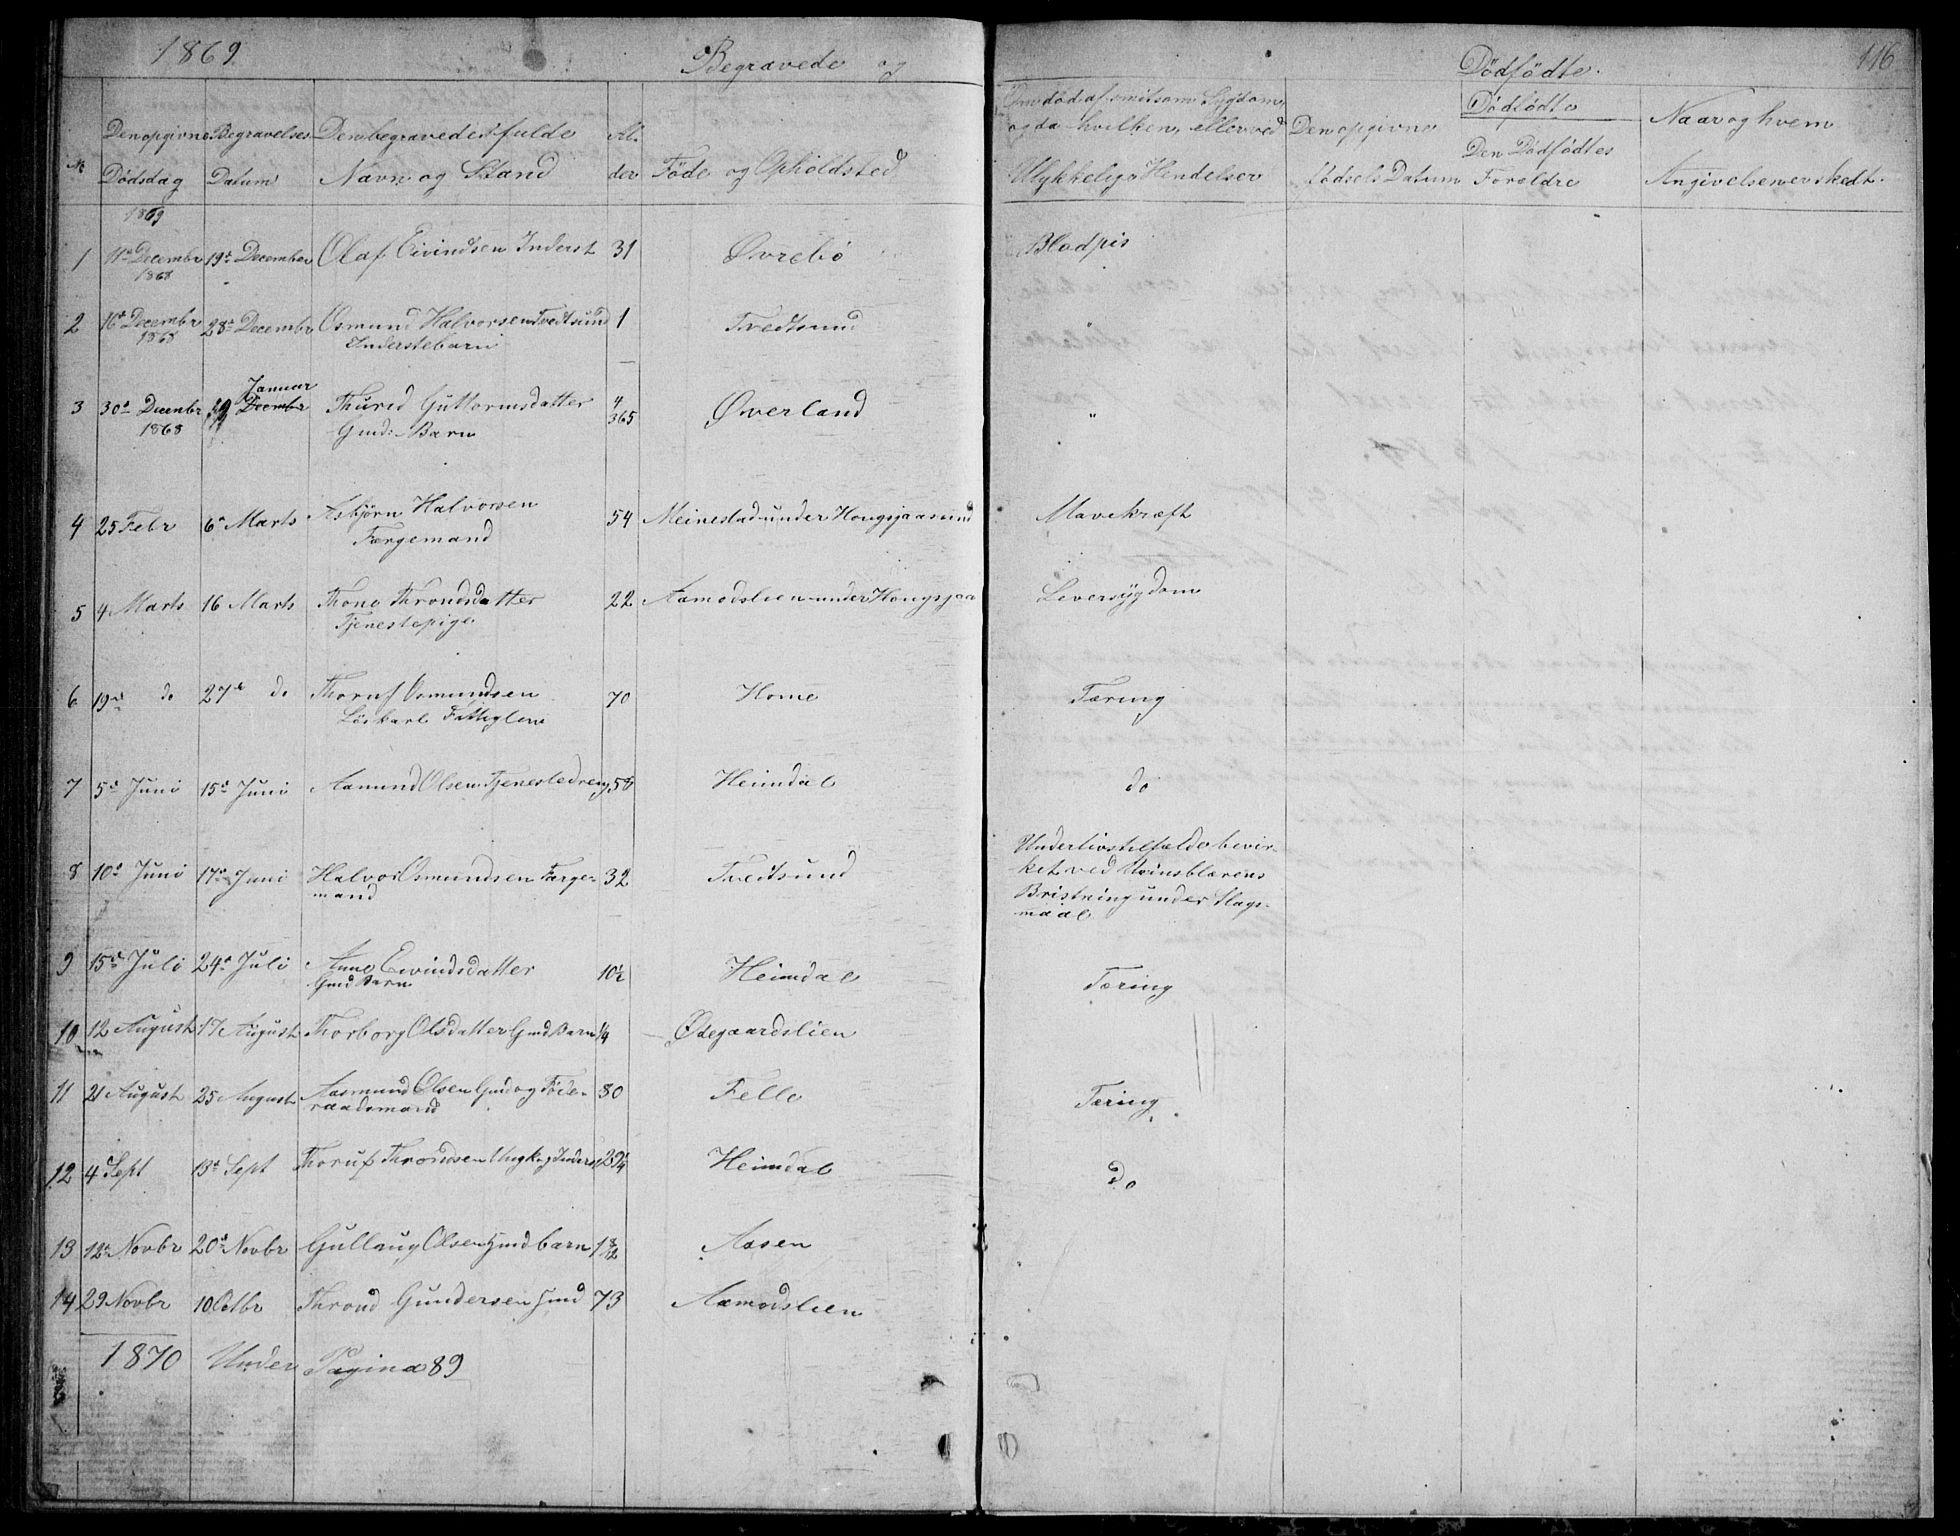 SAKO, Nissedal kirkebøker, G/Gb/L0002: Klokkerbok nr. II 2, 1863-1892, s. 116